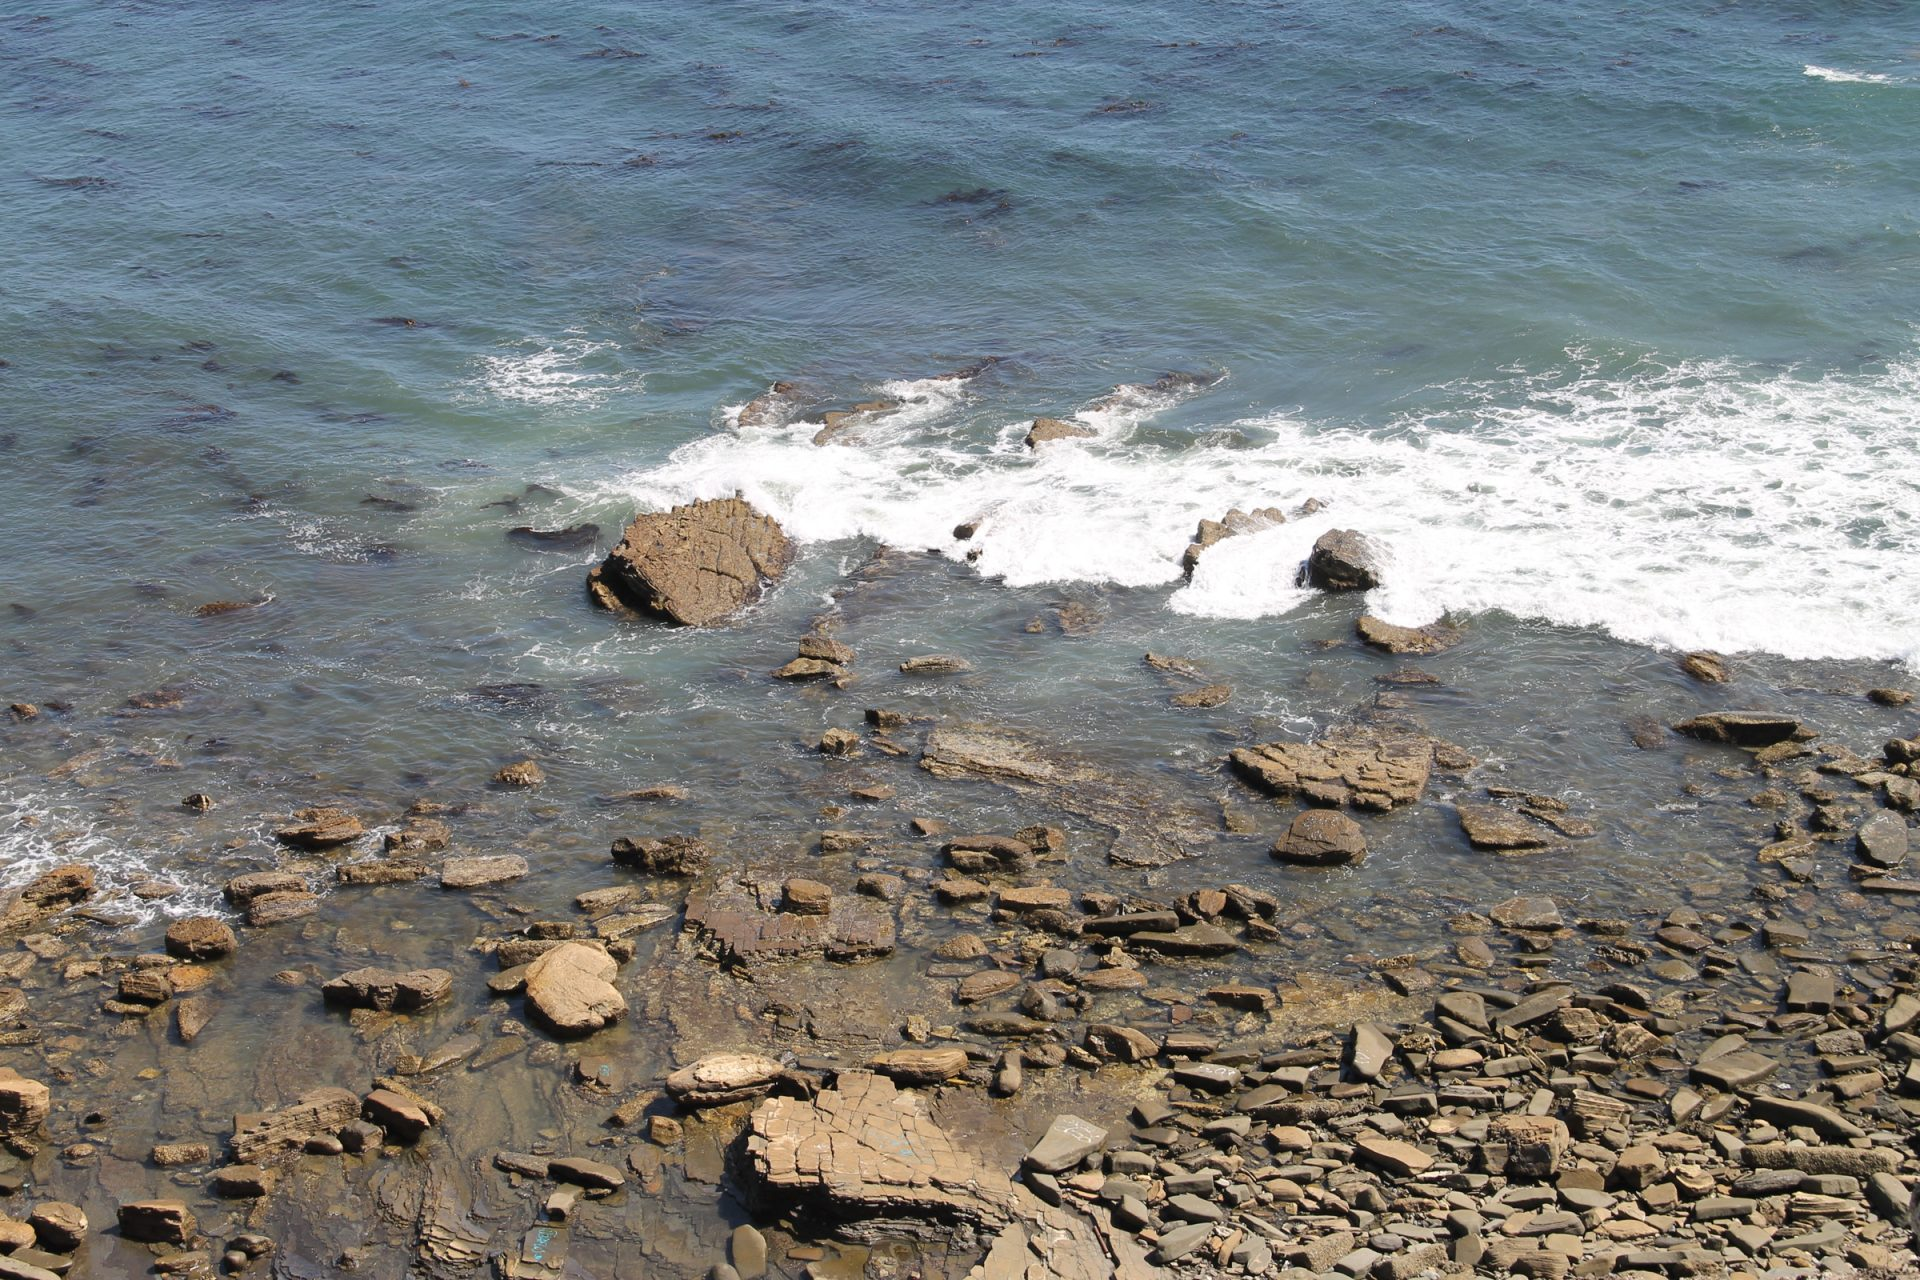 Soft Ocean Waves on Beach Rocks